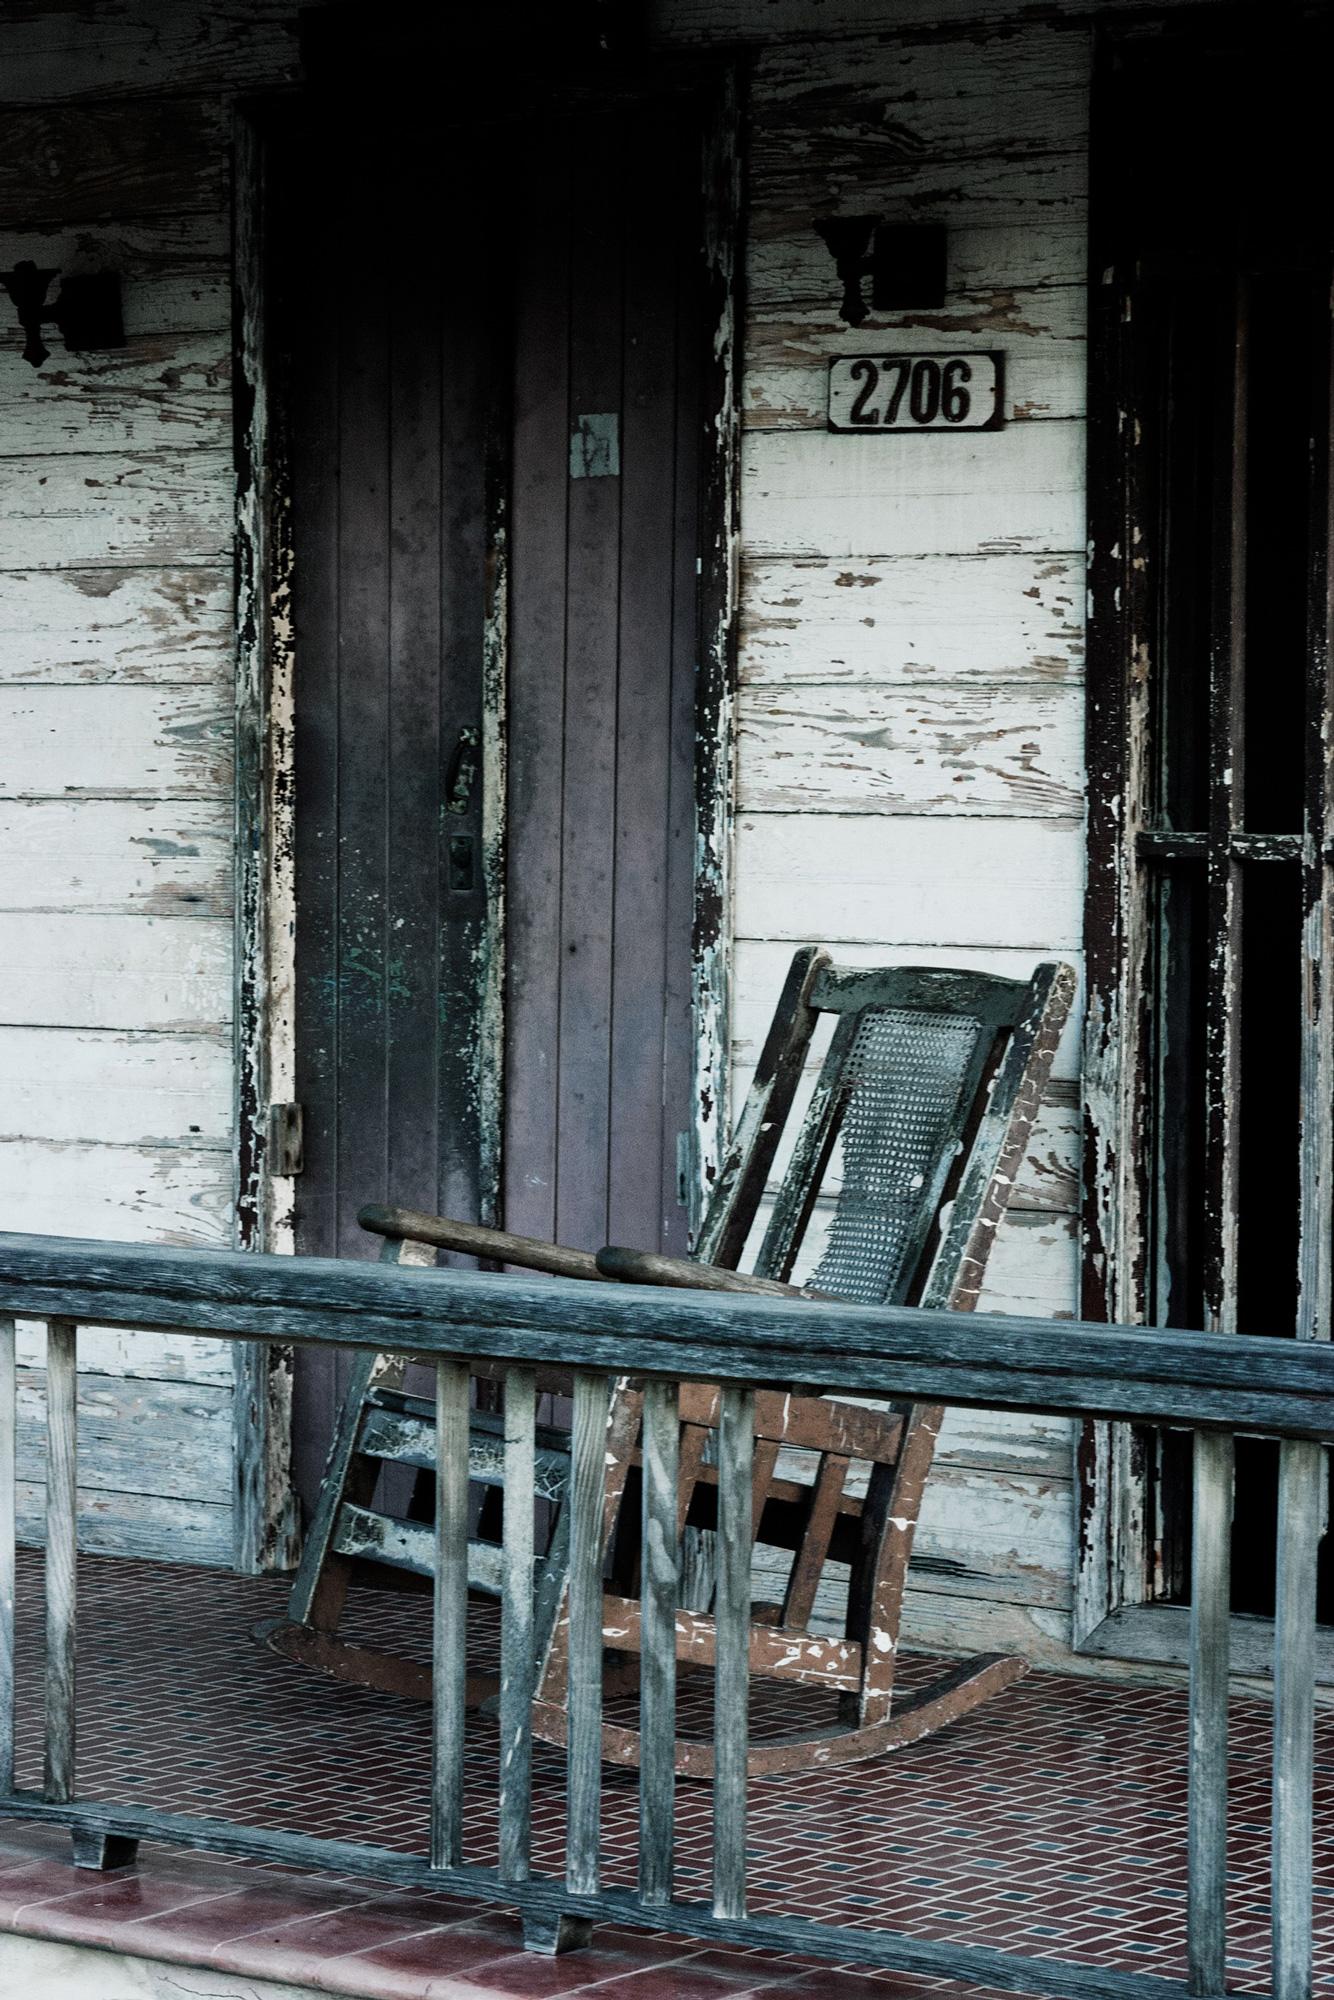 cuba maison chaise berçante balcon